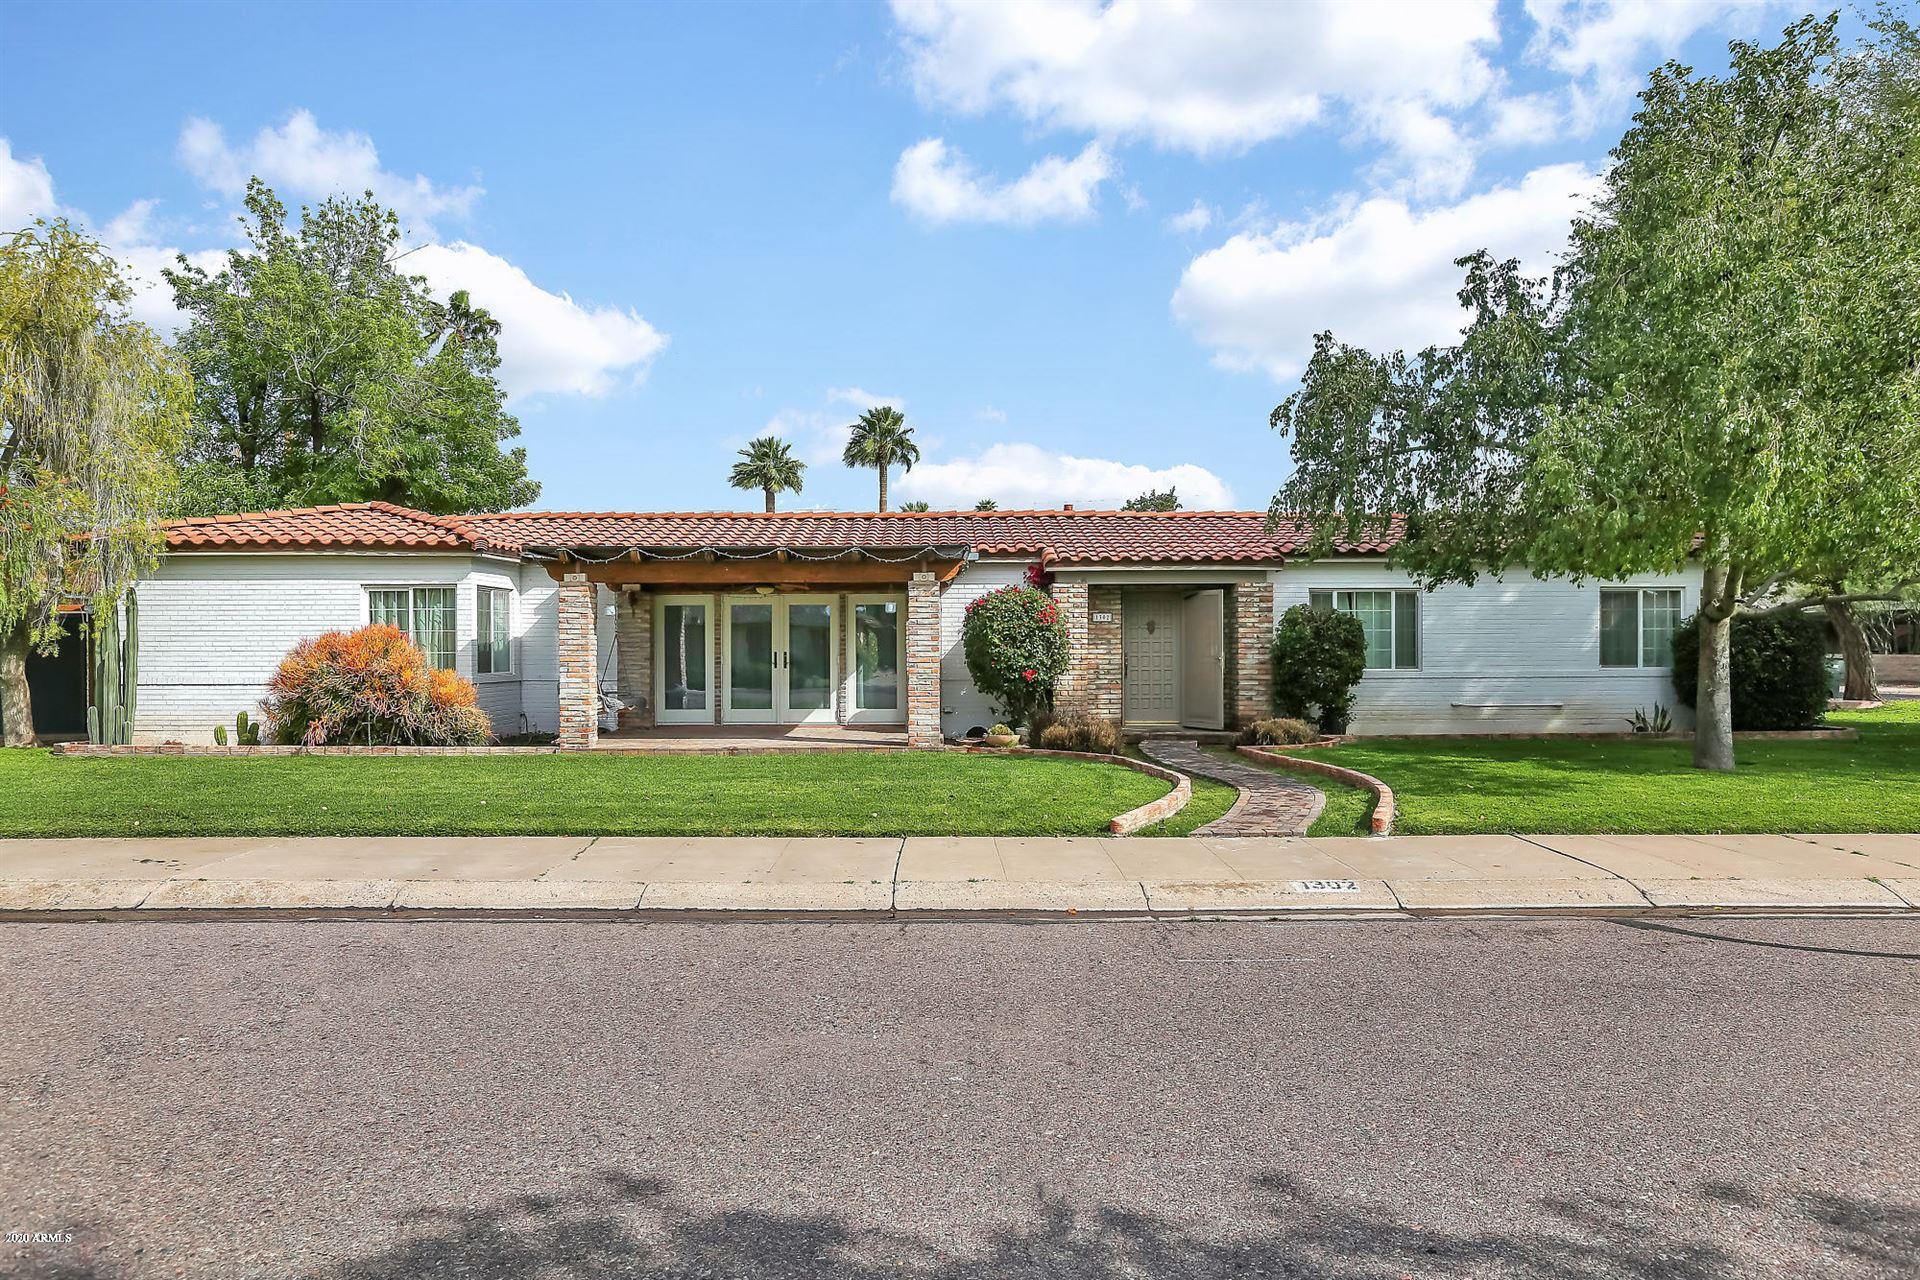 1302 W EDGEMONT Avenue, Phoenix, AZ 85007 - MLS#: 6054012